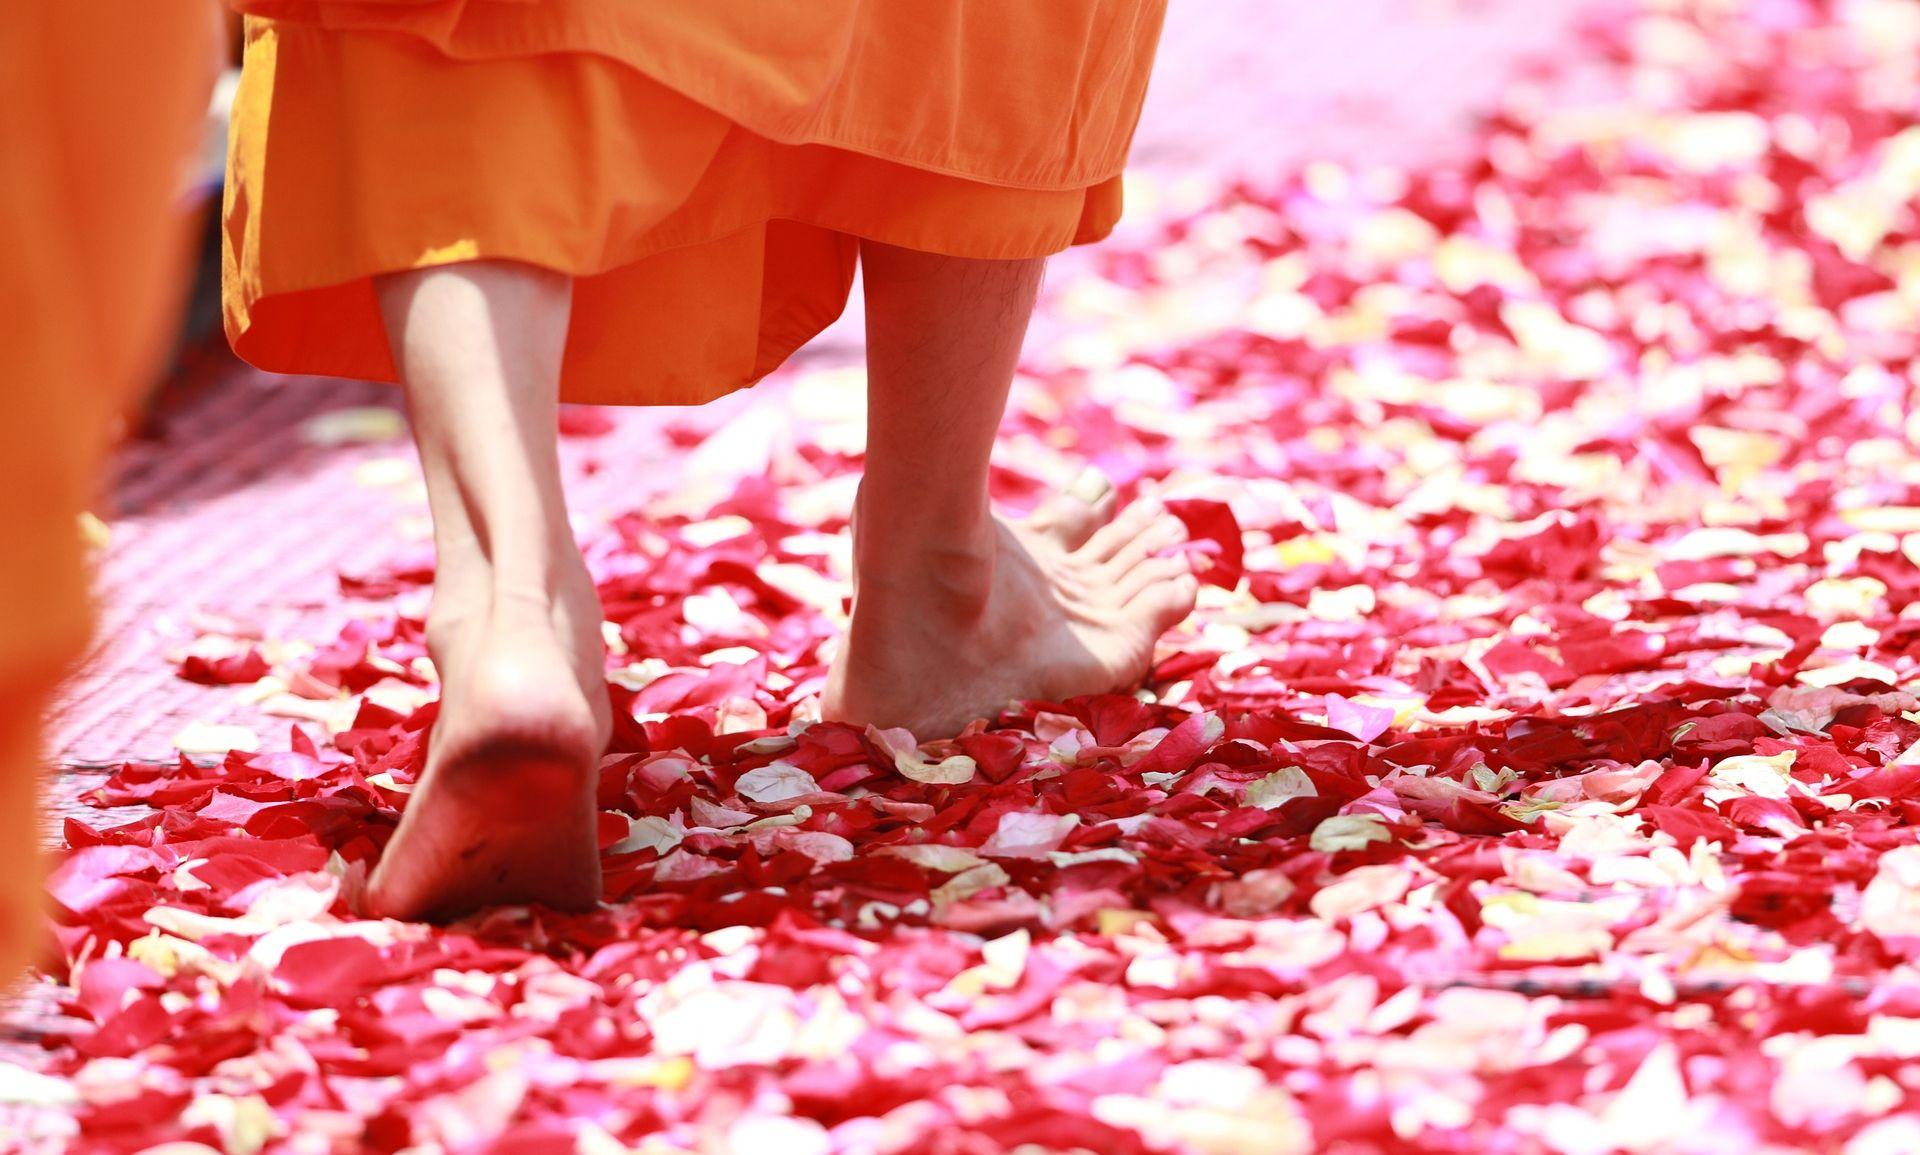 FELJTON Budistička redovnica u borbi protiv predrasuda o ženskoj duhovnosti